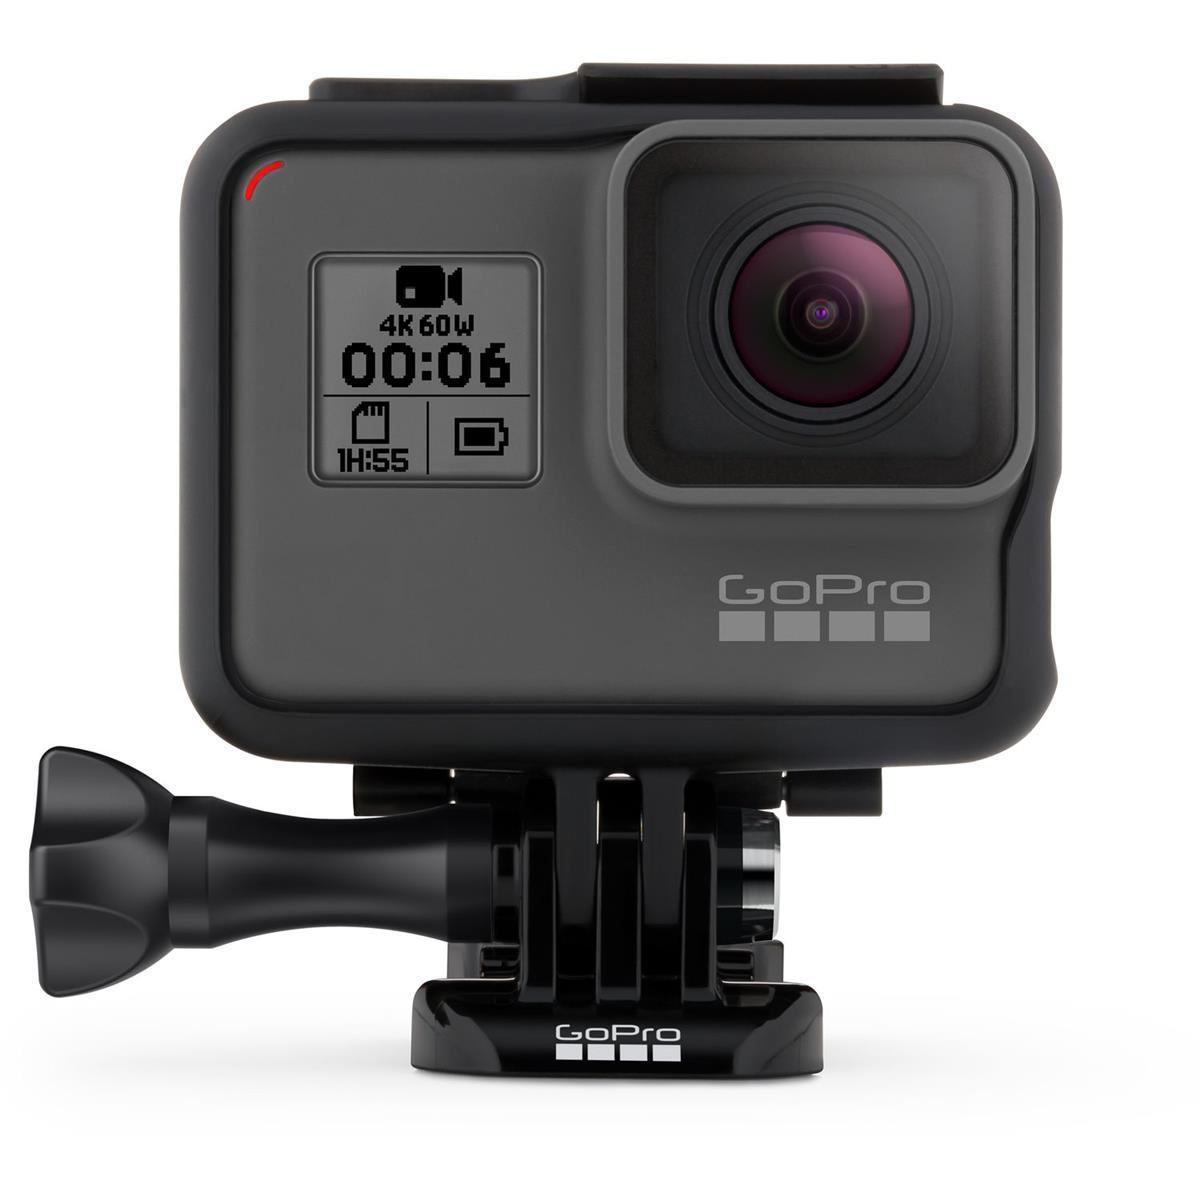 GoPro Hero 6 (black edition) $399 + free s/h